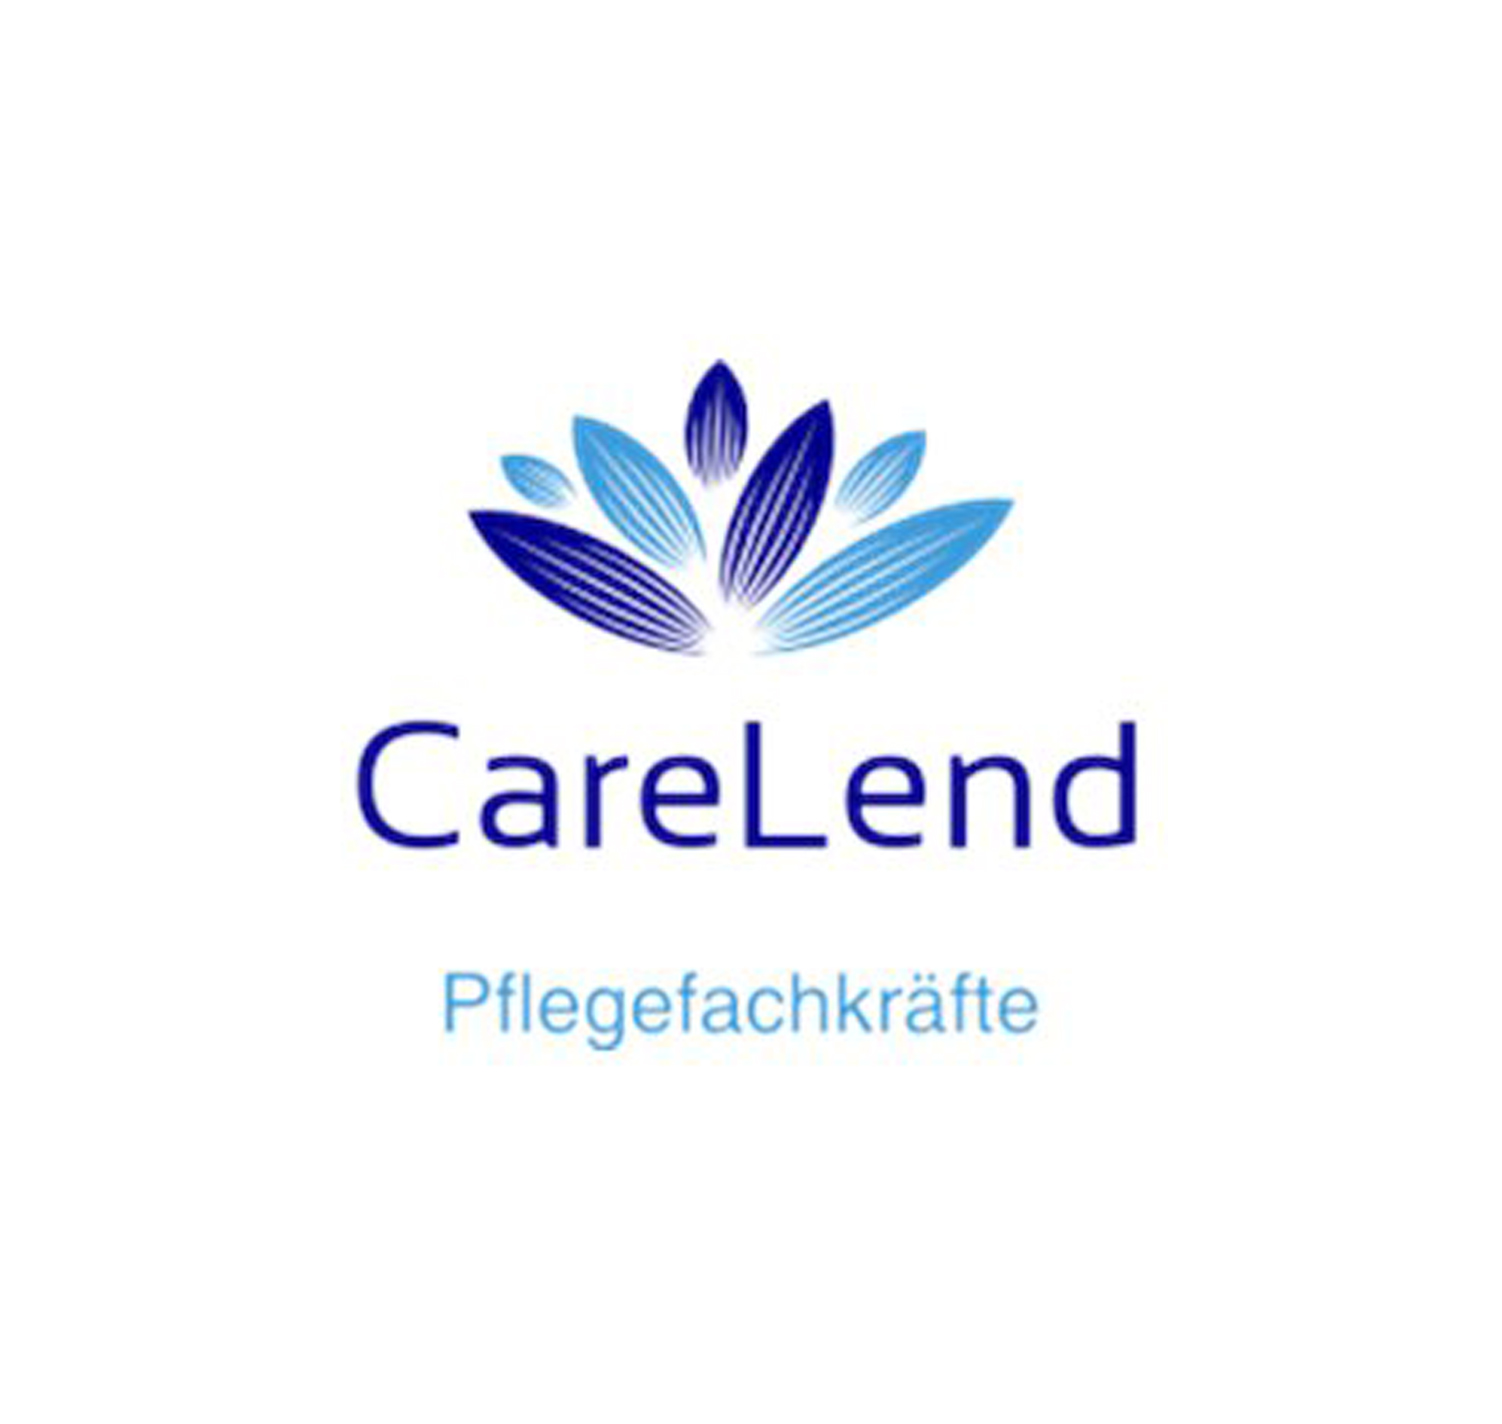 CareLend GmbH